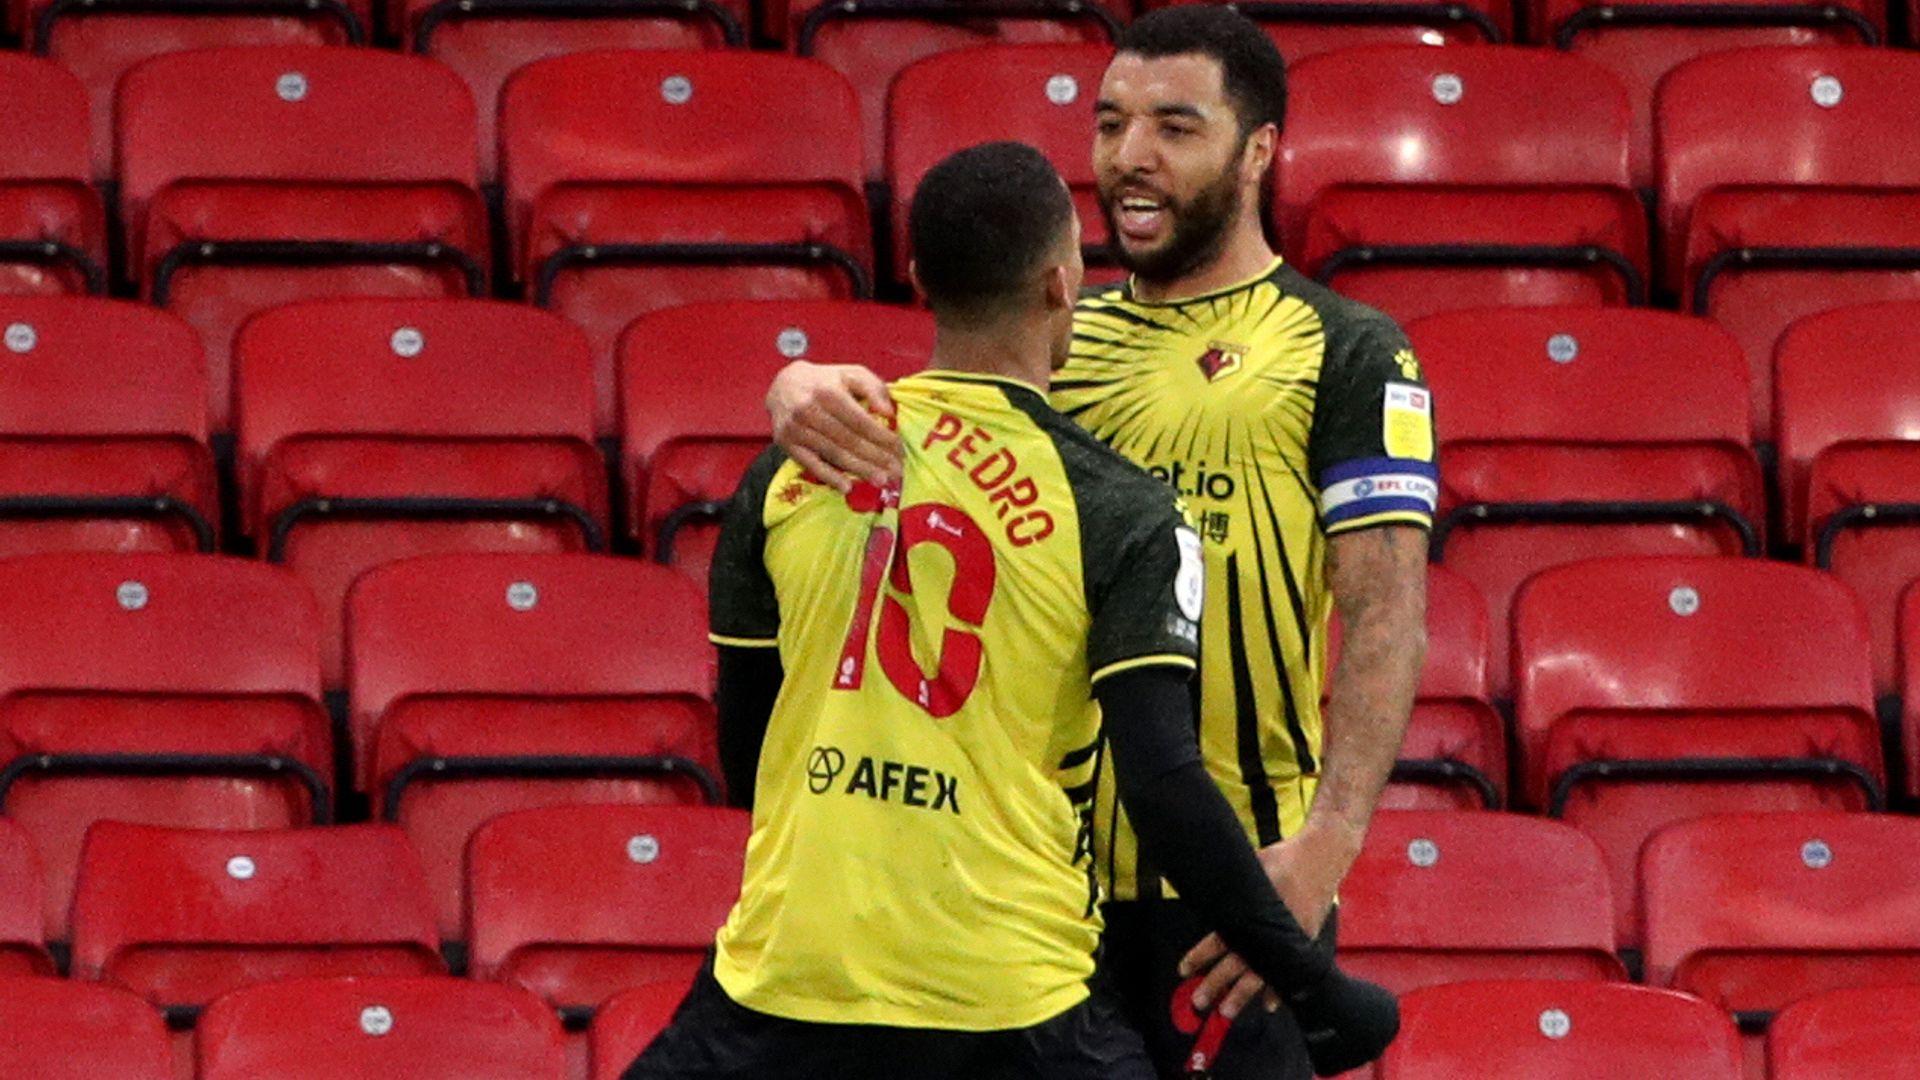 Cleverley, Pedro score in Watford win